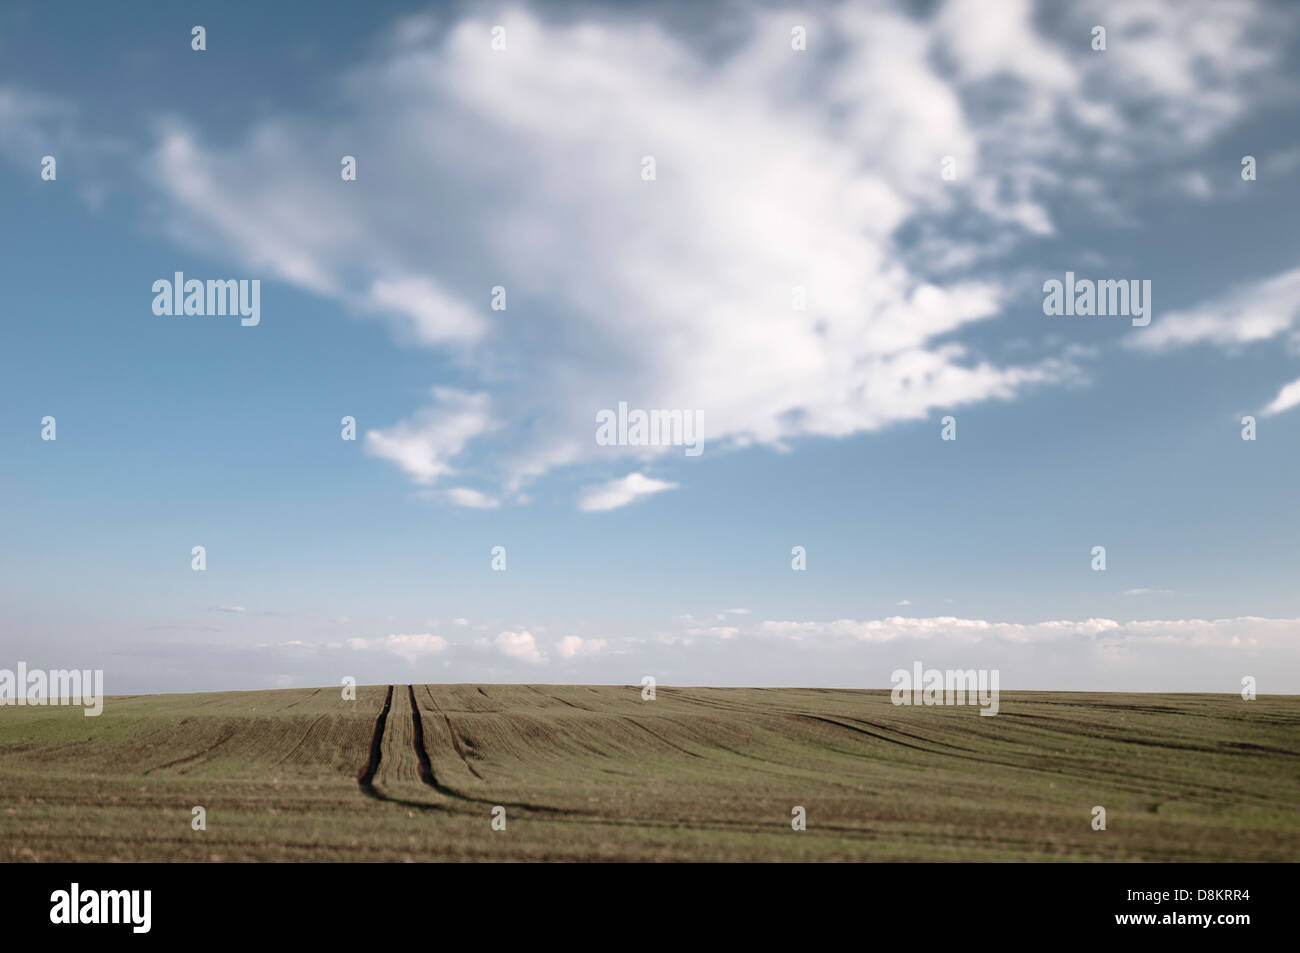 Field in Teutschenthal Saalekreis District, Saxony-Anhalt, Germany - Stock Image